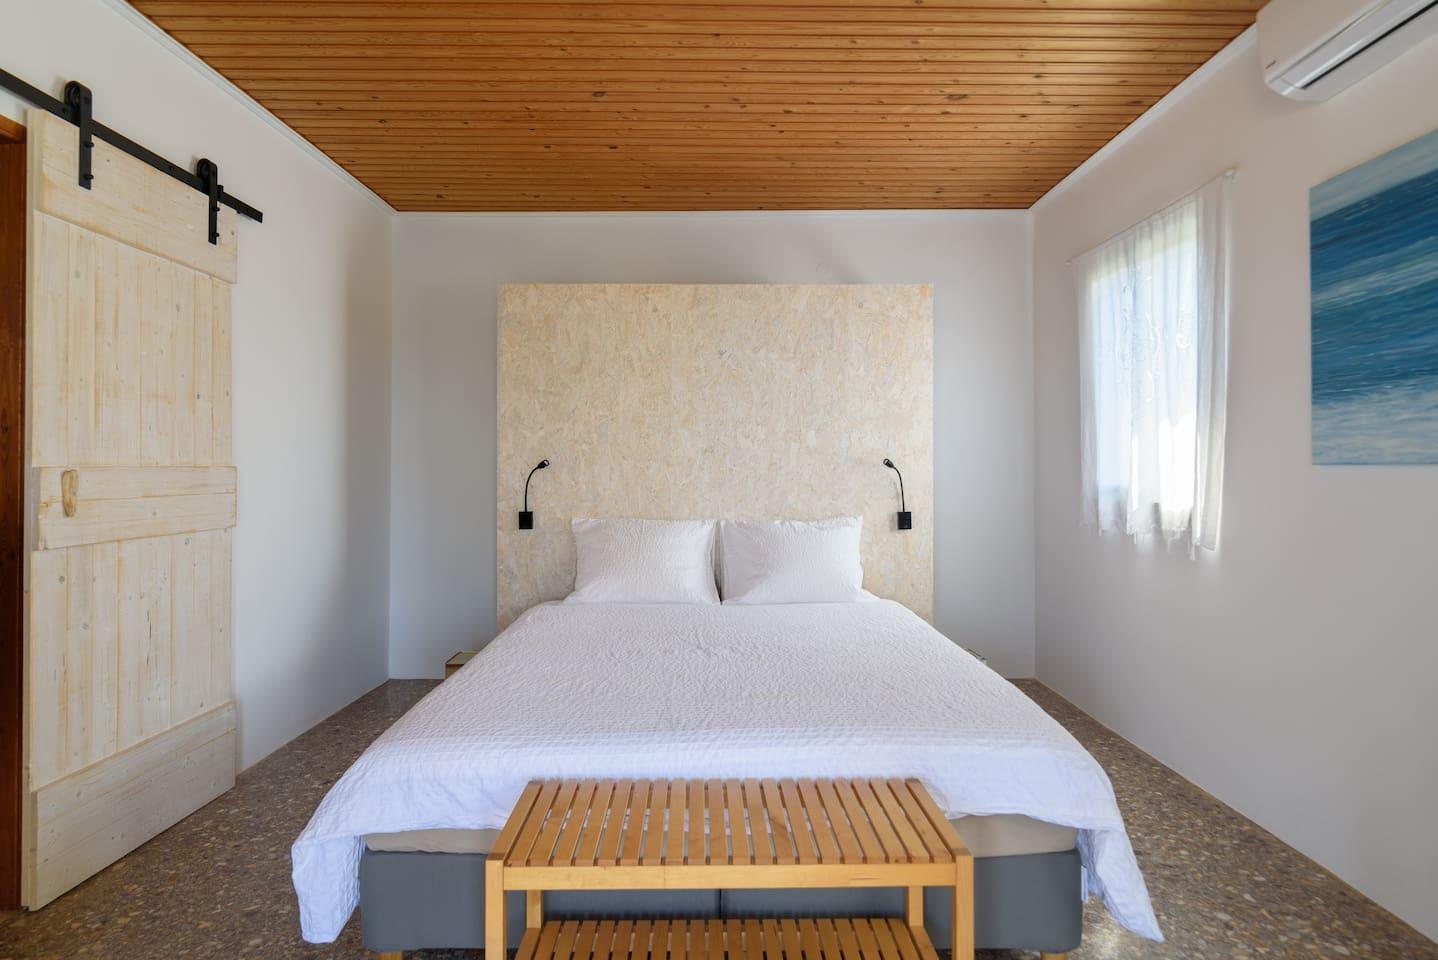 Sleep well ..............on a comfortable boxspring bed